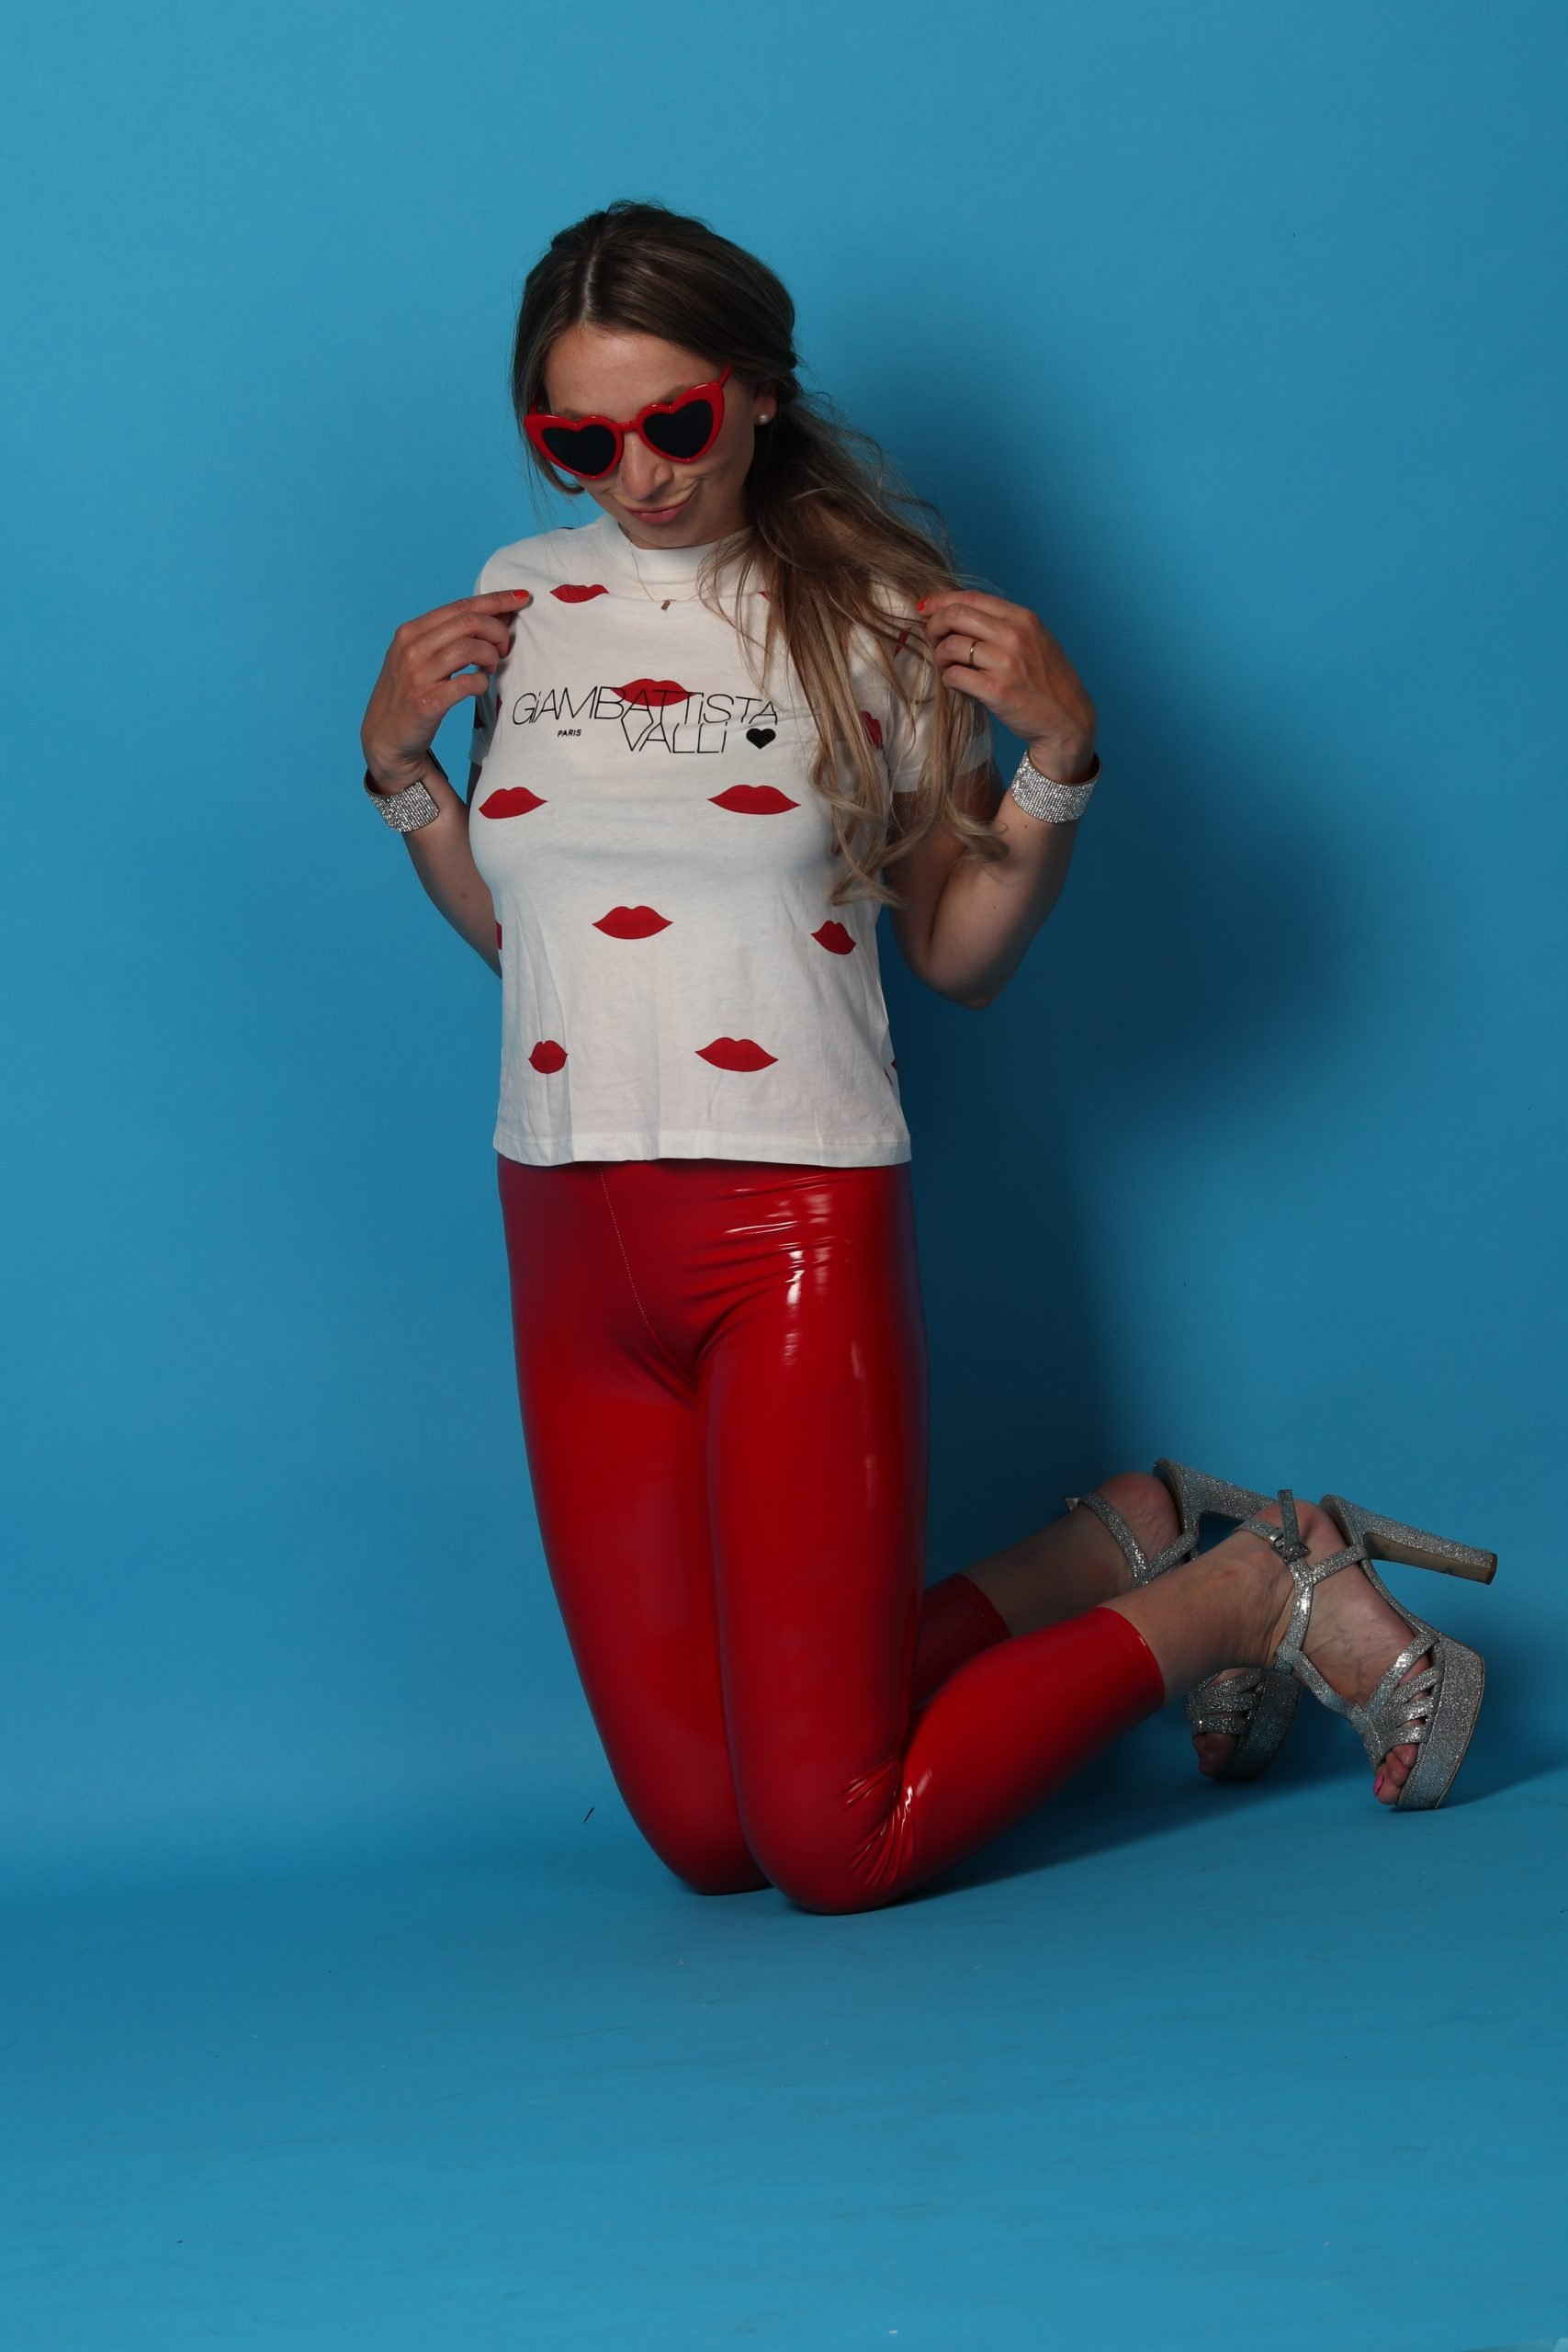 fashion mode roze astrid alida fotografie fotostudio  lak broek rood hartjesbril giambattista valli hm h&m hartjes zonnebril parel oorbellen